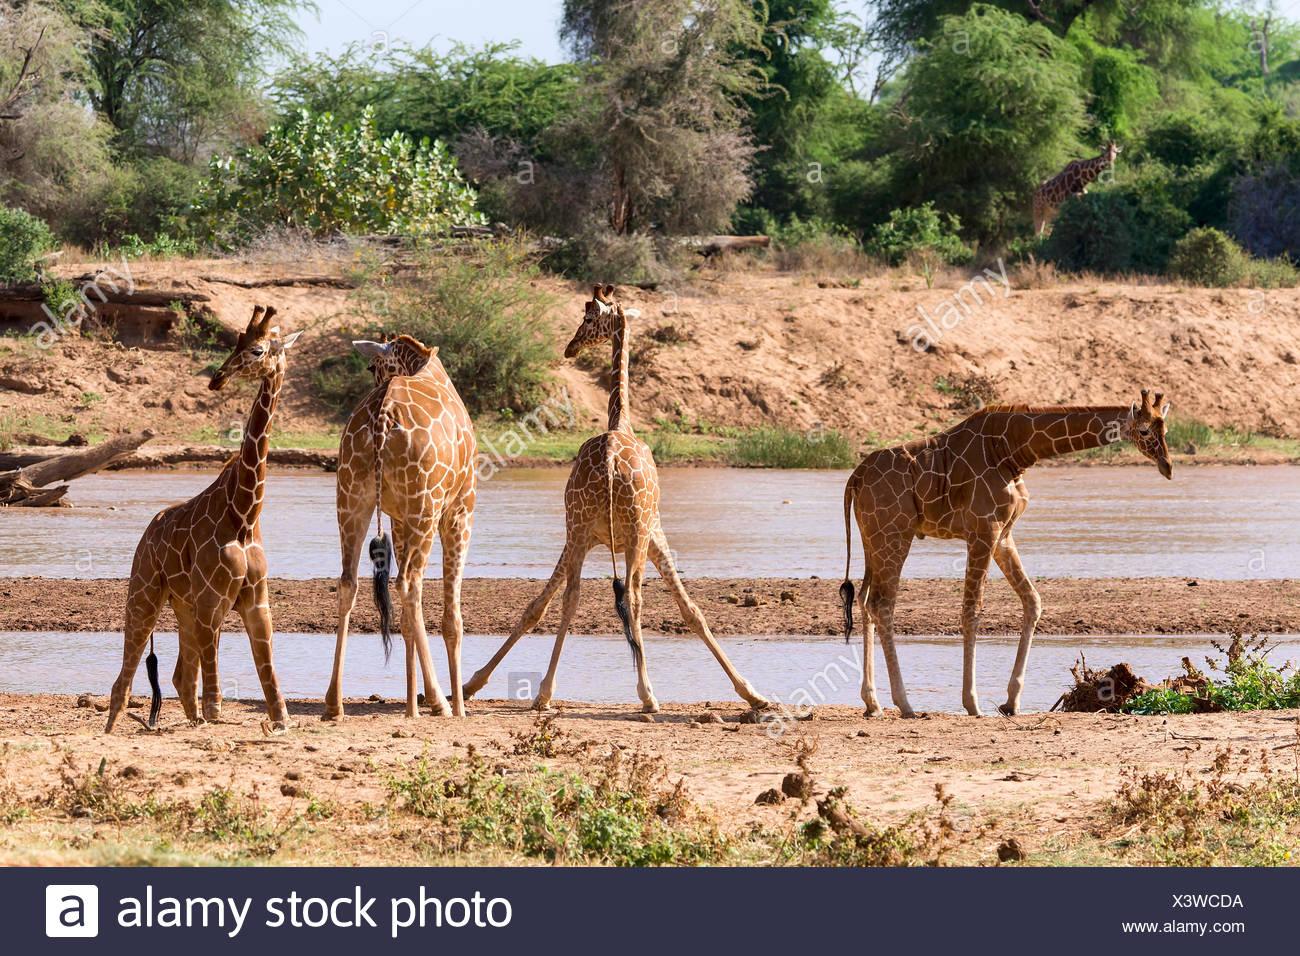 Jirafas reticulado o jirafas somalí (Giraffa camelopardalis reticulata) por el río, Reserva Nacional de Samburu, Kenia Foto de stock